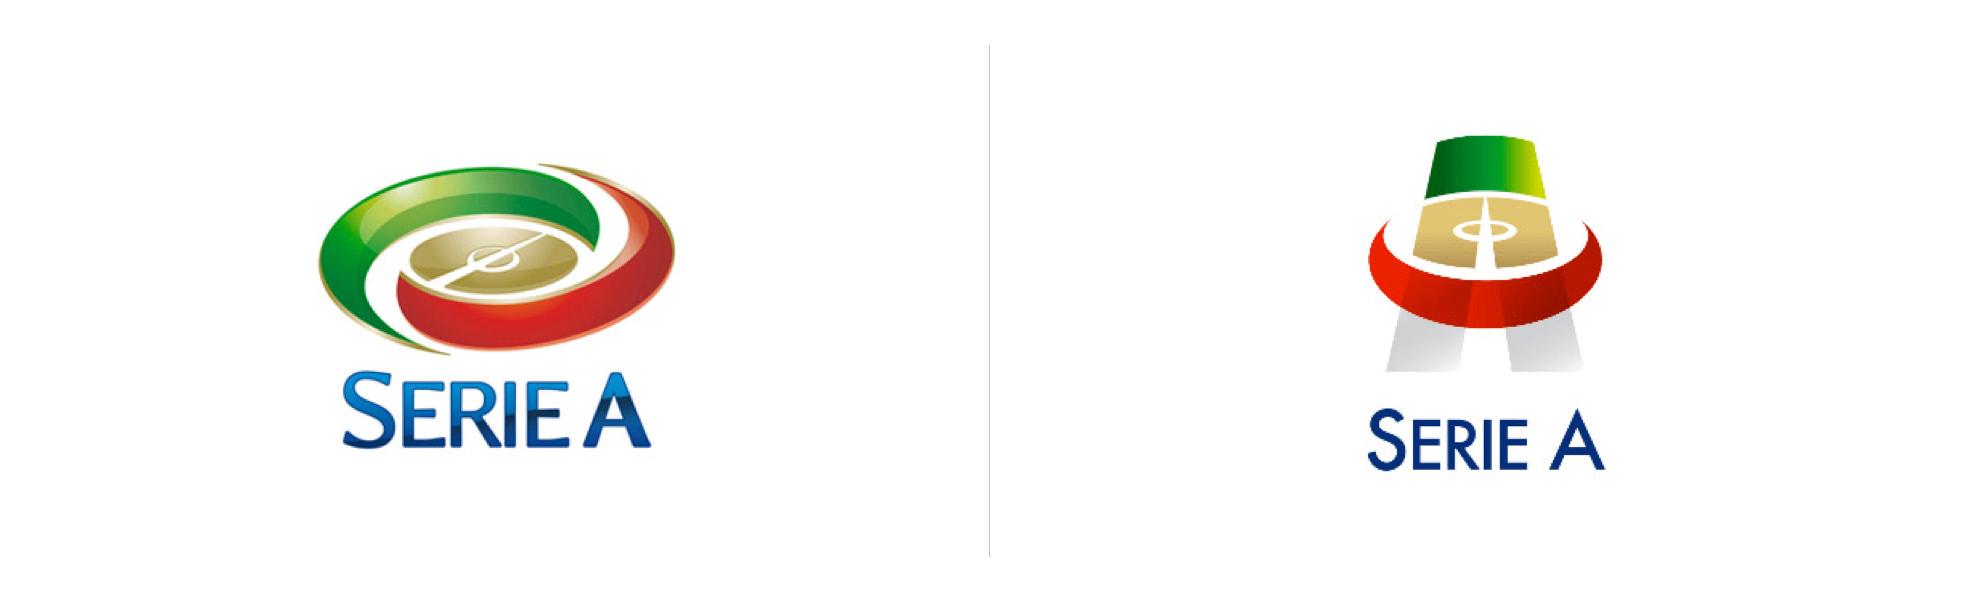 serie anowe istare logo